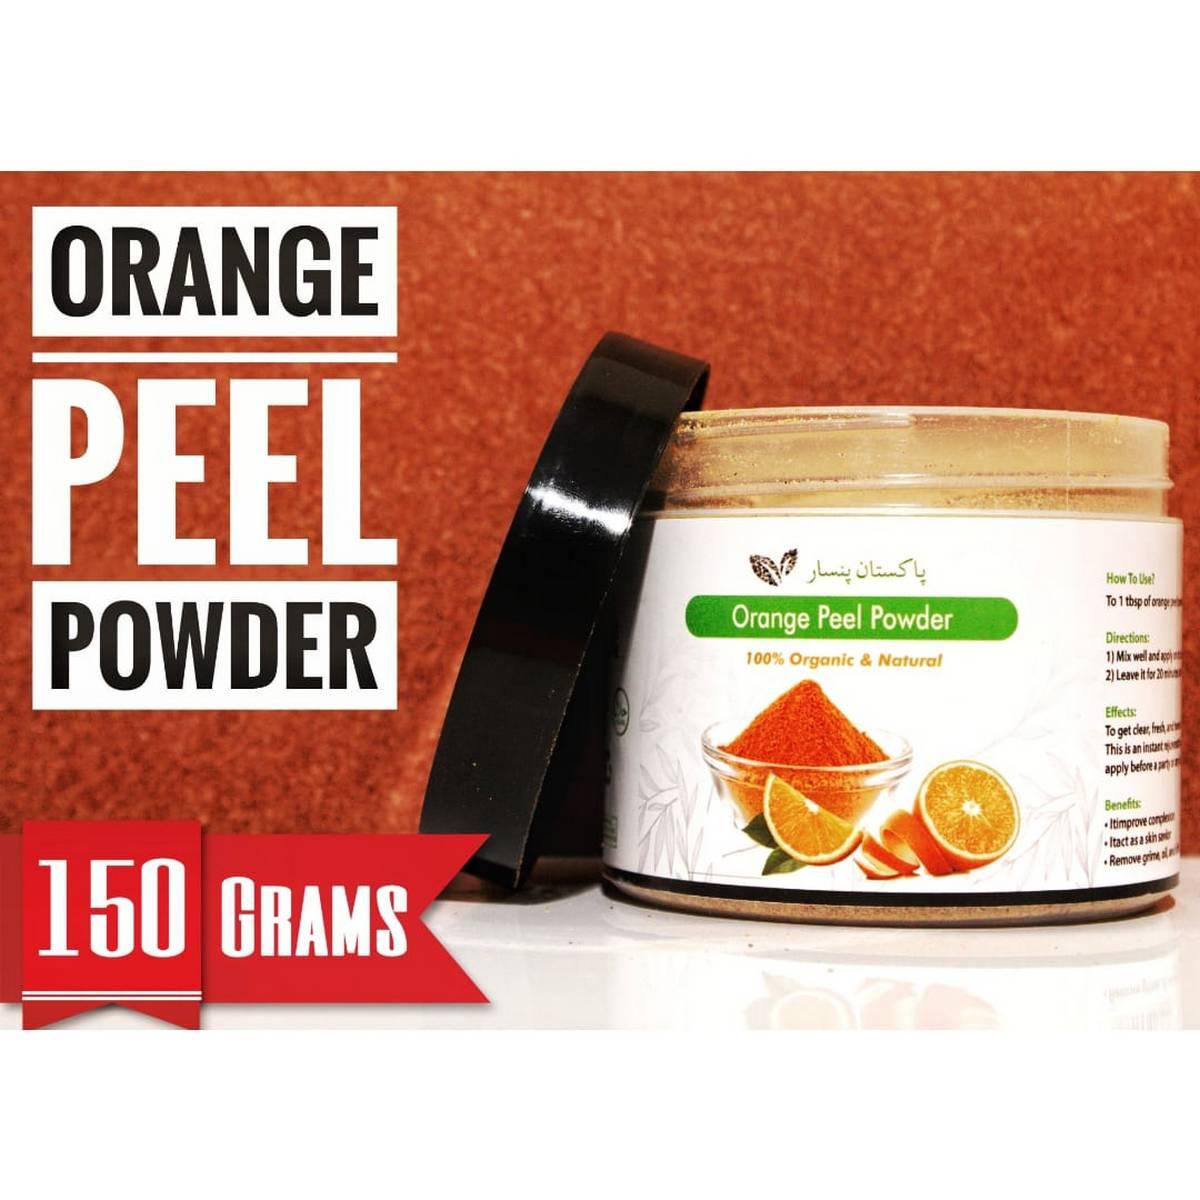 Orange Peel Powder - Pakistan Pansar 100% Pure Natural Organic (Orange Peel Powder for face and skin care )